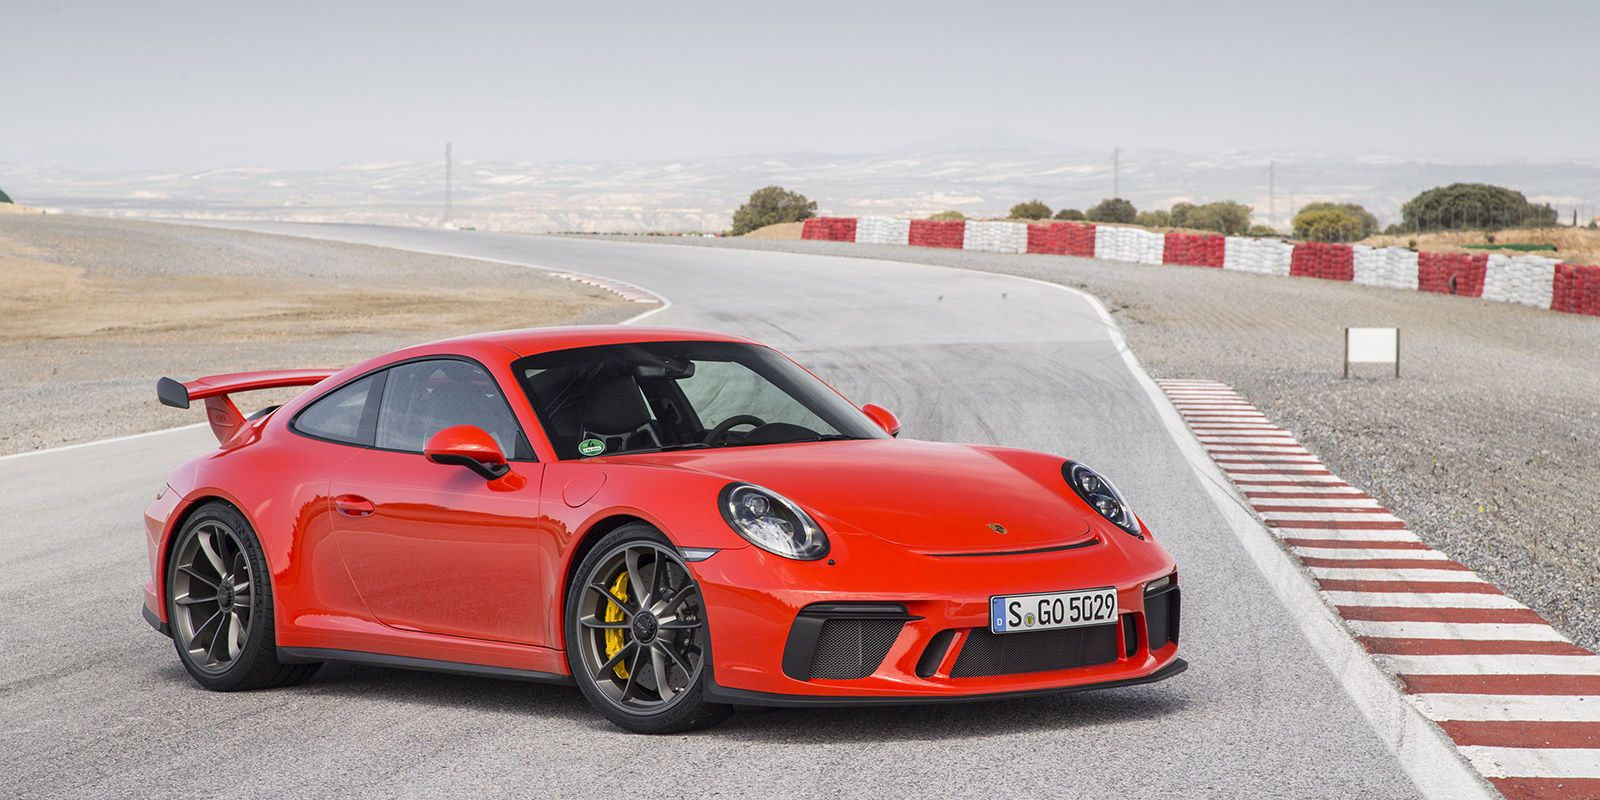 The 15 best cars under 100 000 2012 porsche 911 porsche 911 and carrera